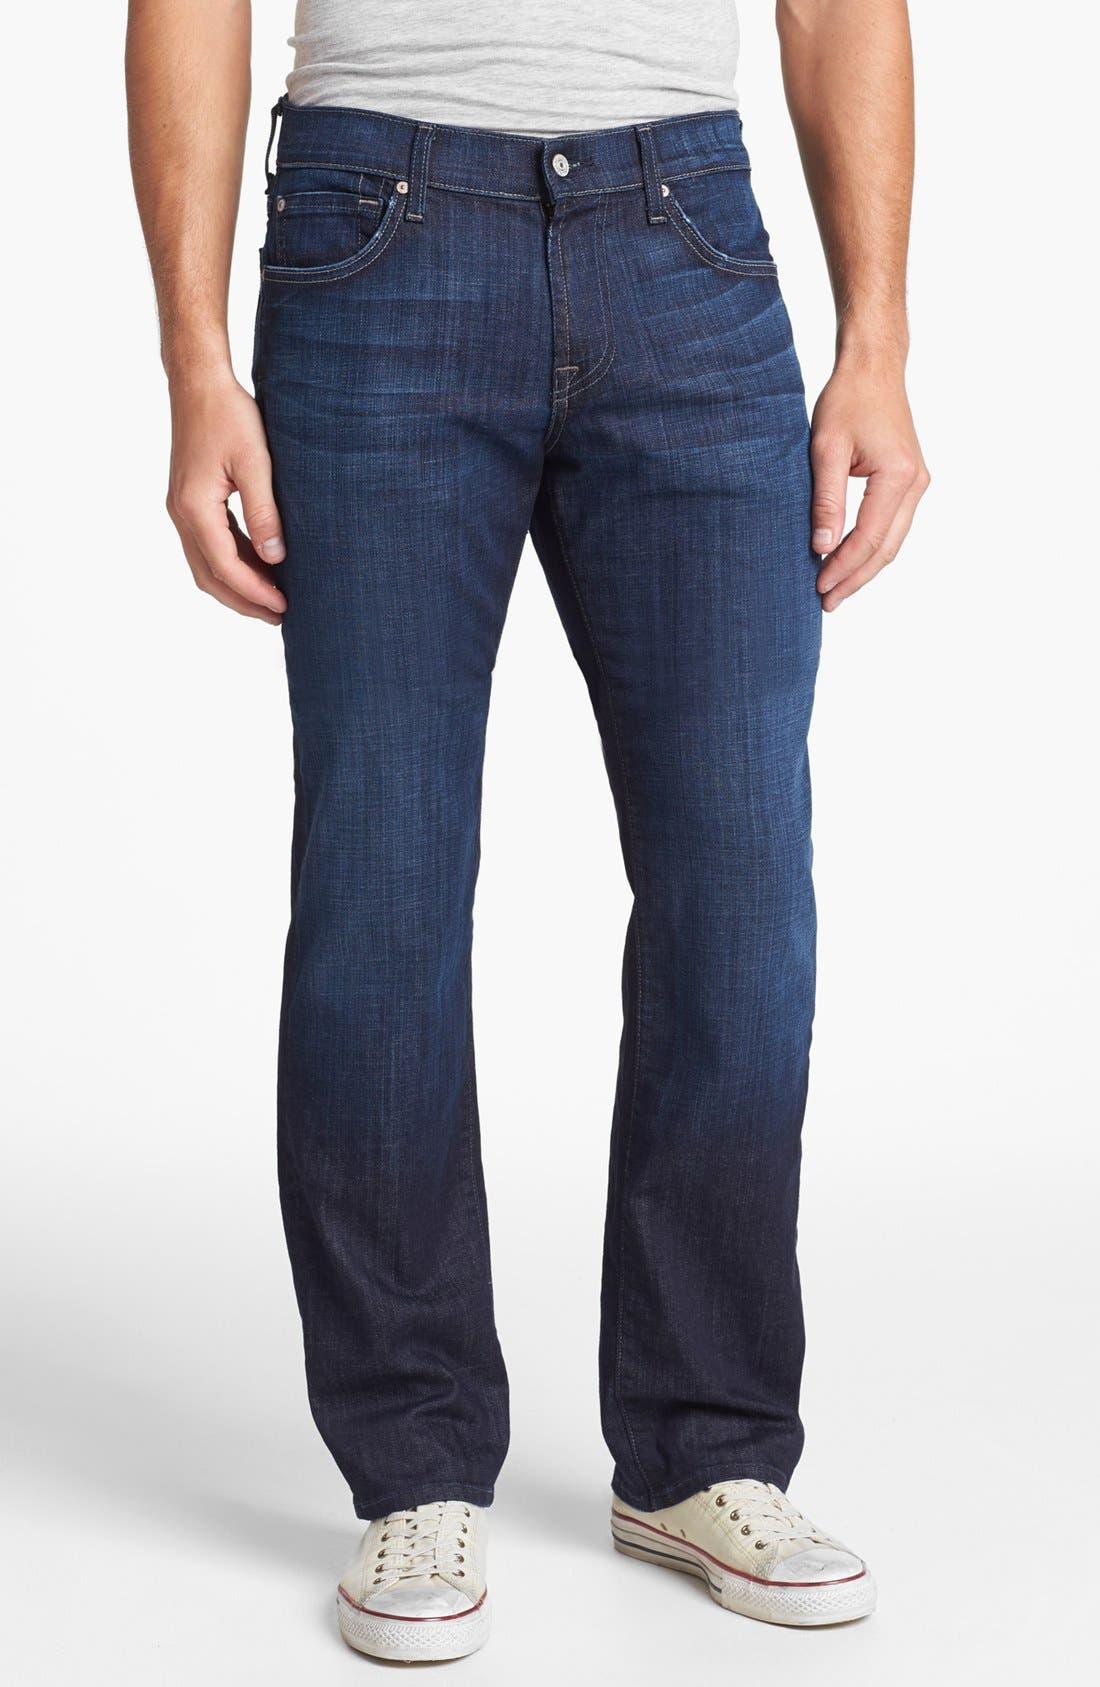 Austyn Relaxed Straight Leg Jeans,                         Main,                         color, Los Angeles Dark